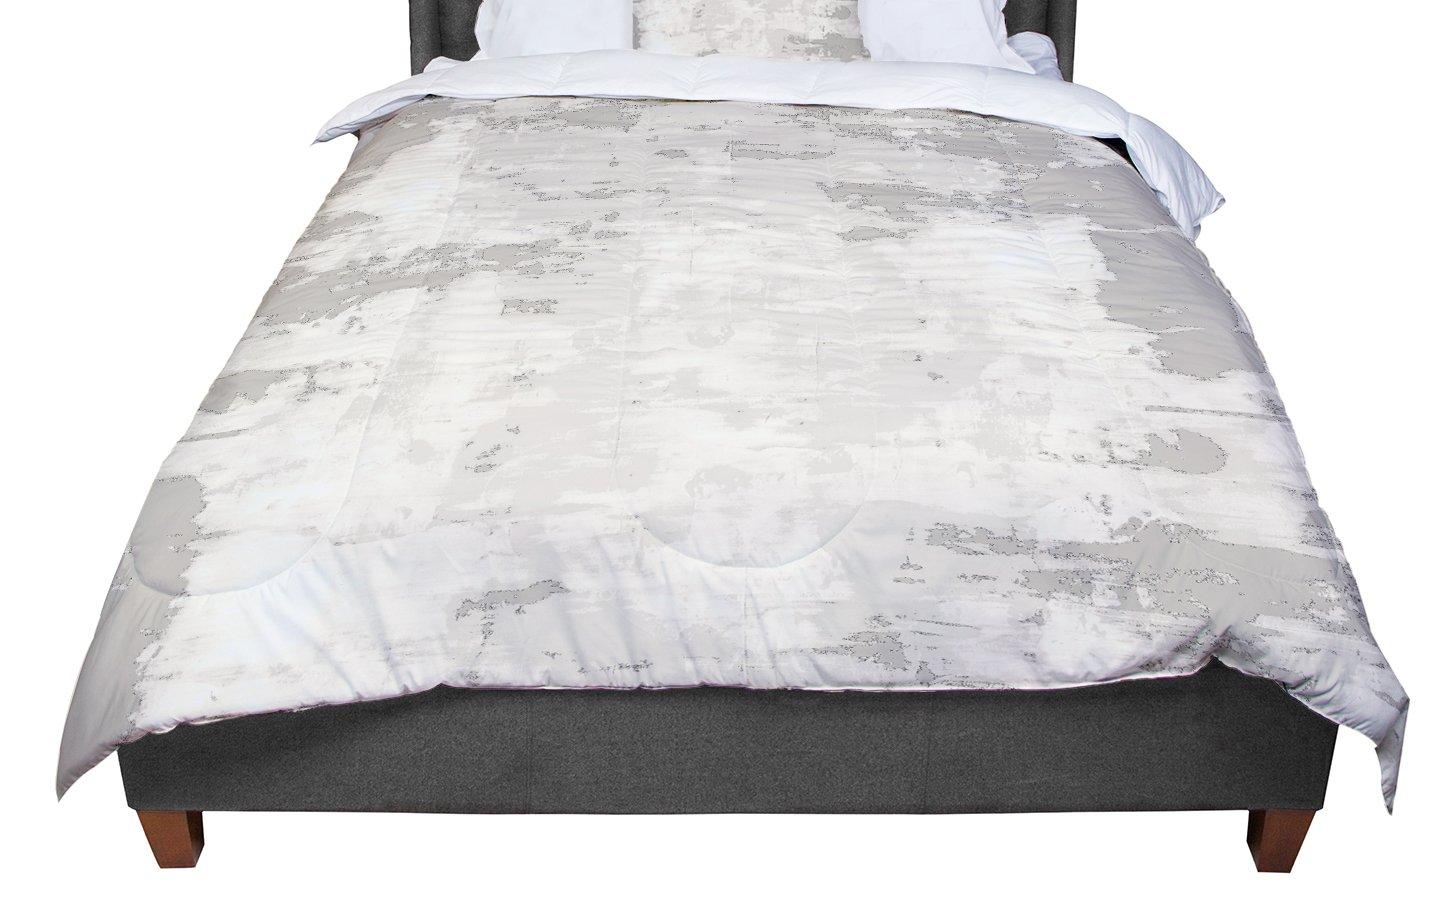 KESS InHouse CarolLynn Tice 'Secluded' Brown Tan Queen Comforter, 88' X 88'